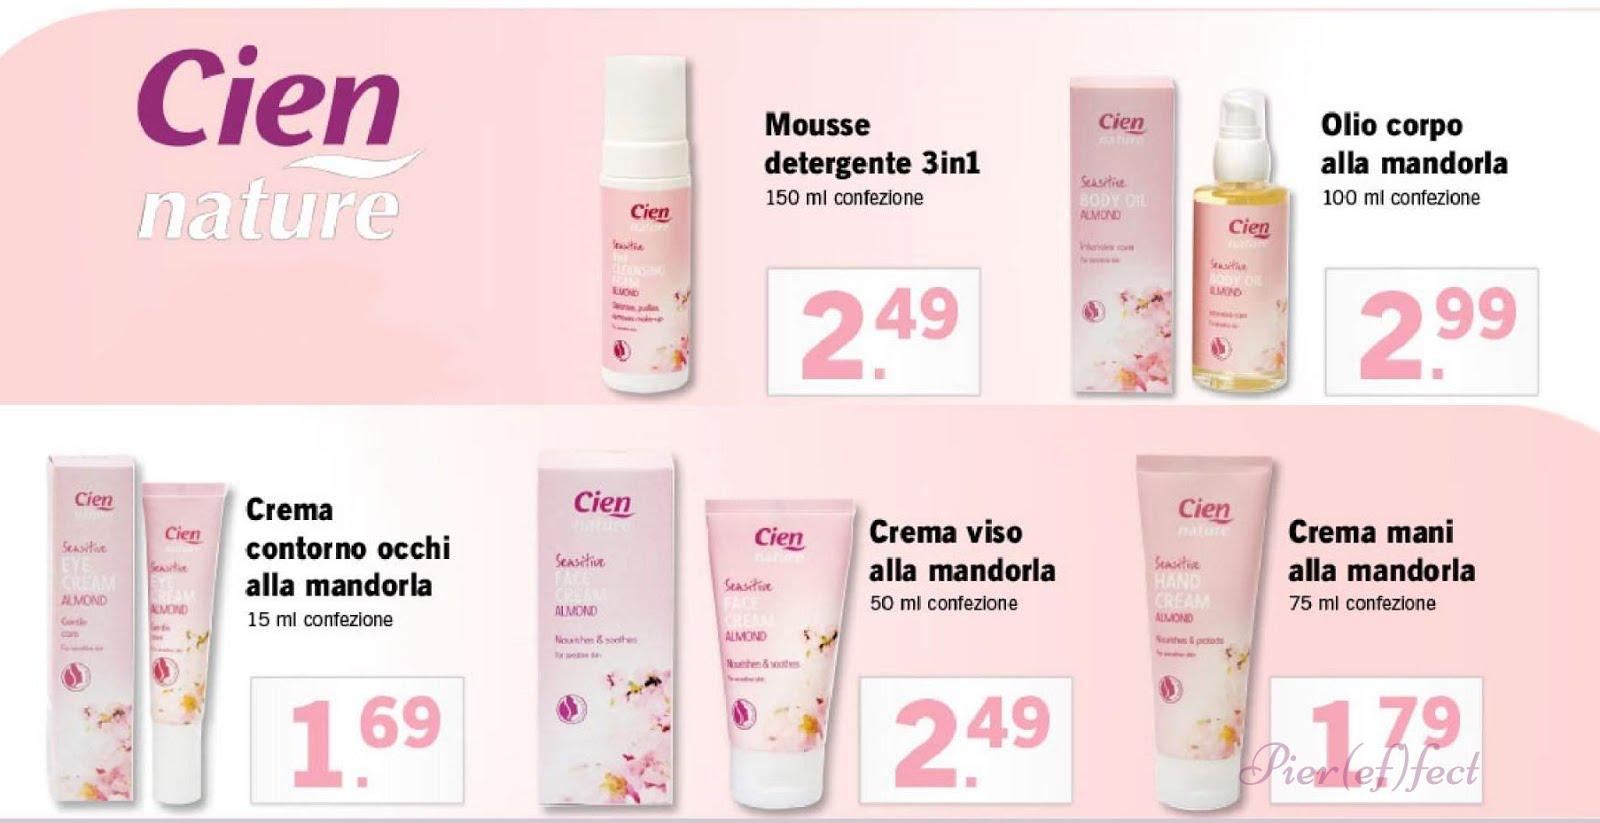 Beauty Cues Br Cien Nature Sensitive Alla Mandorla La Mia Recensione Finalmente Pier Ef Fect